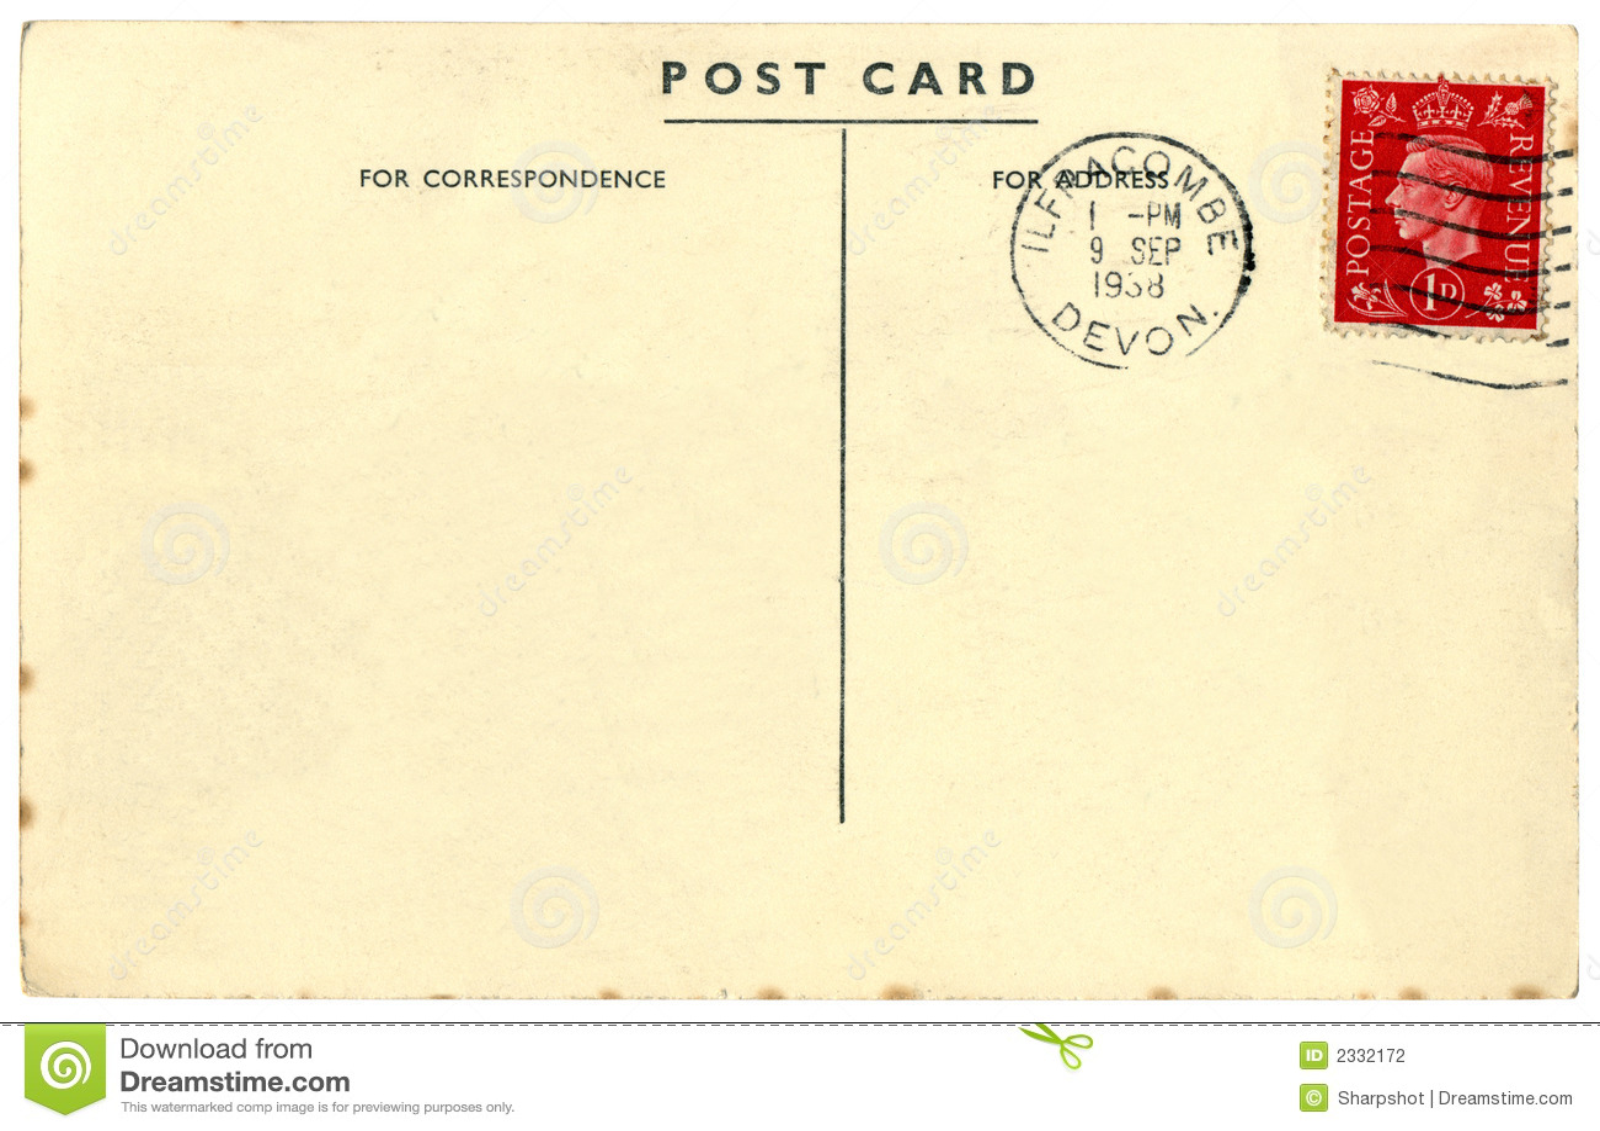 Populaire Carte Postale Des Anglais De Cru Photo stock - Image: 2332172 KL44